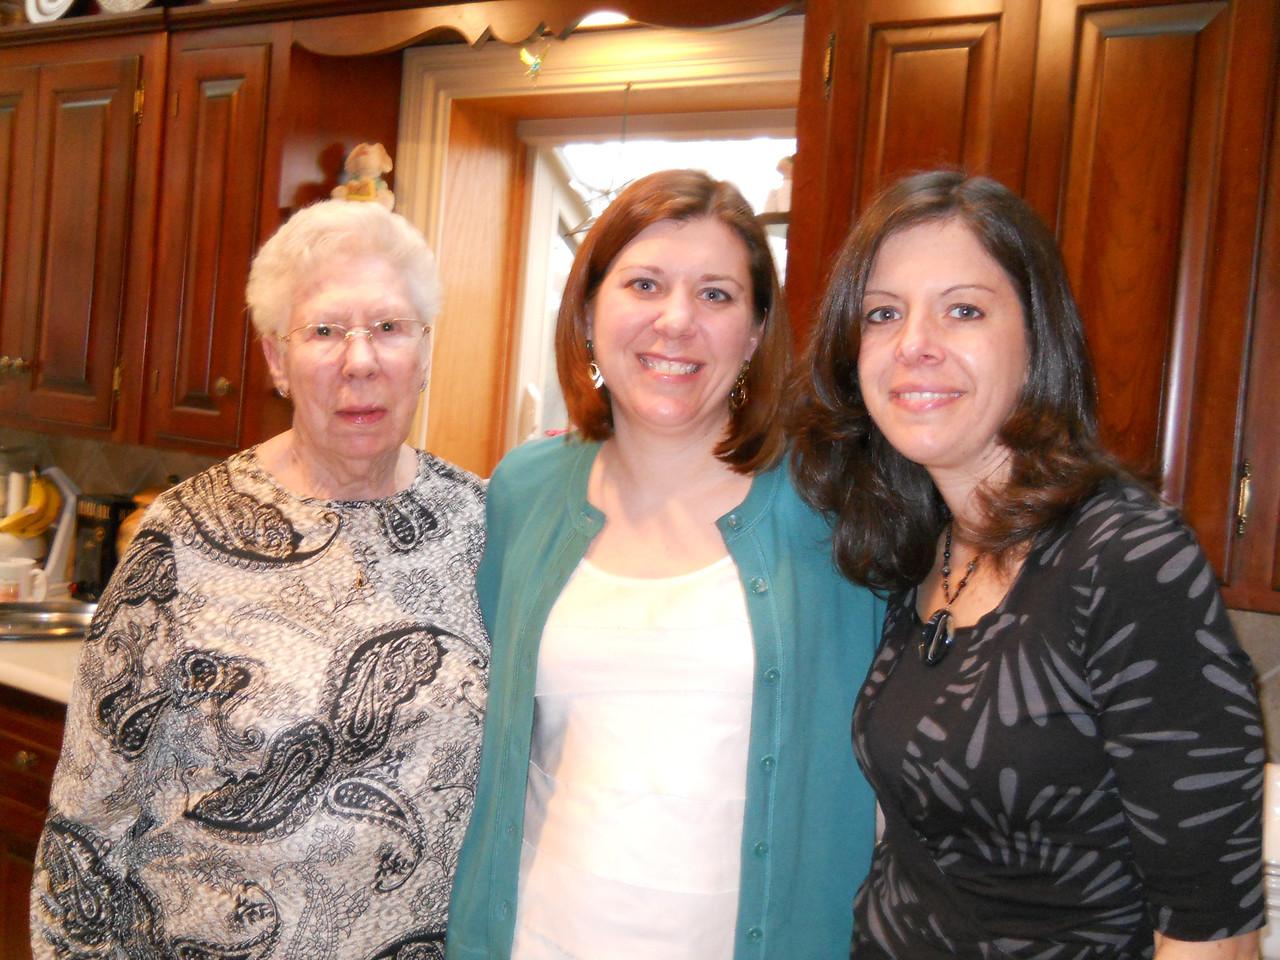 Nana, Ilsa and Cara (Ilsa's friend and Alison's mother)